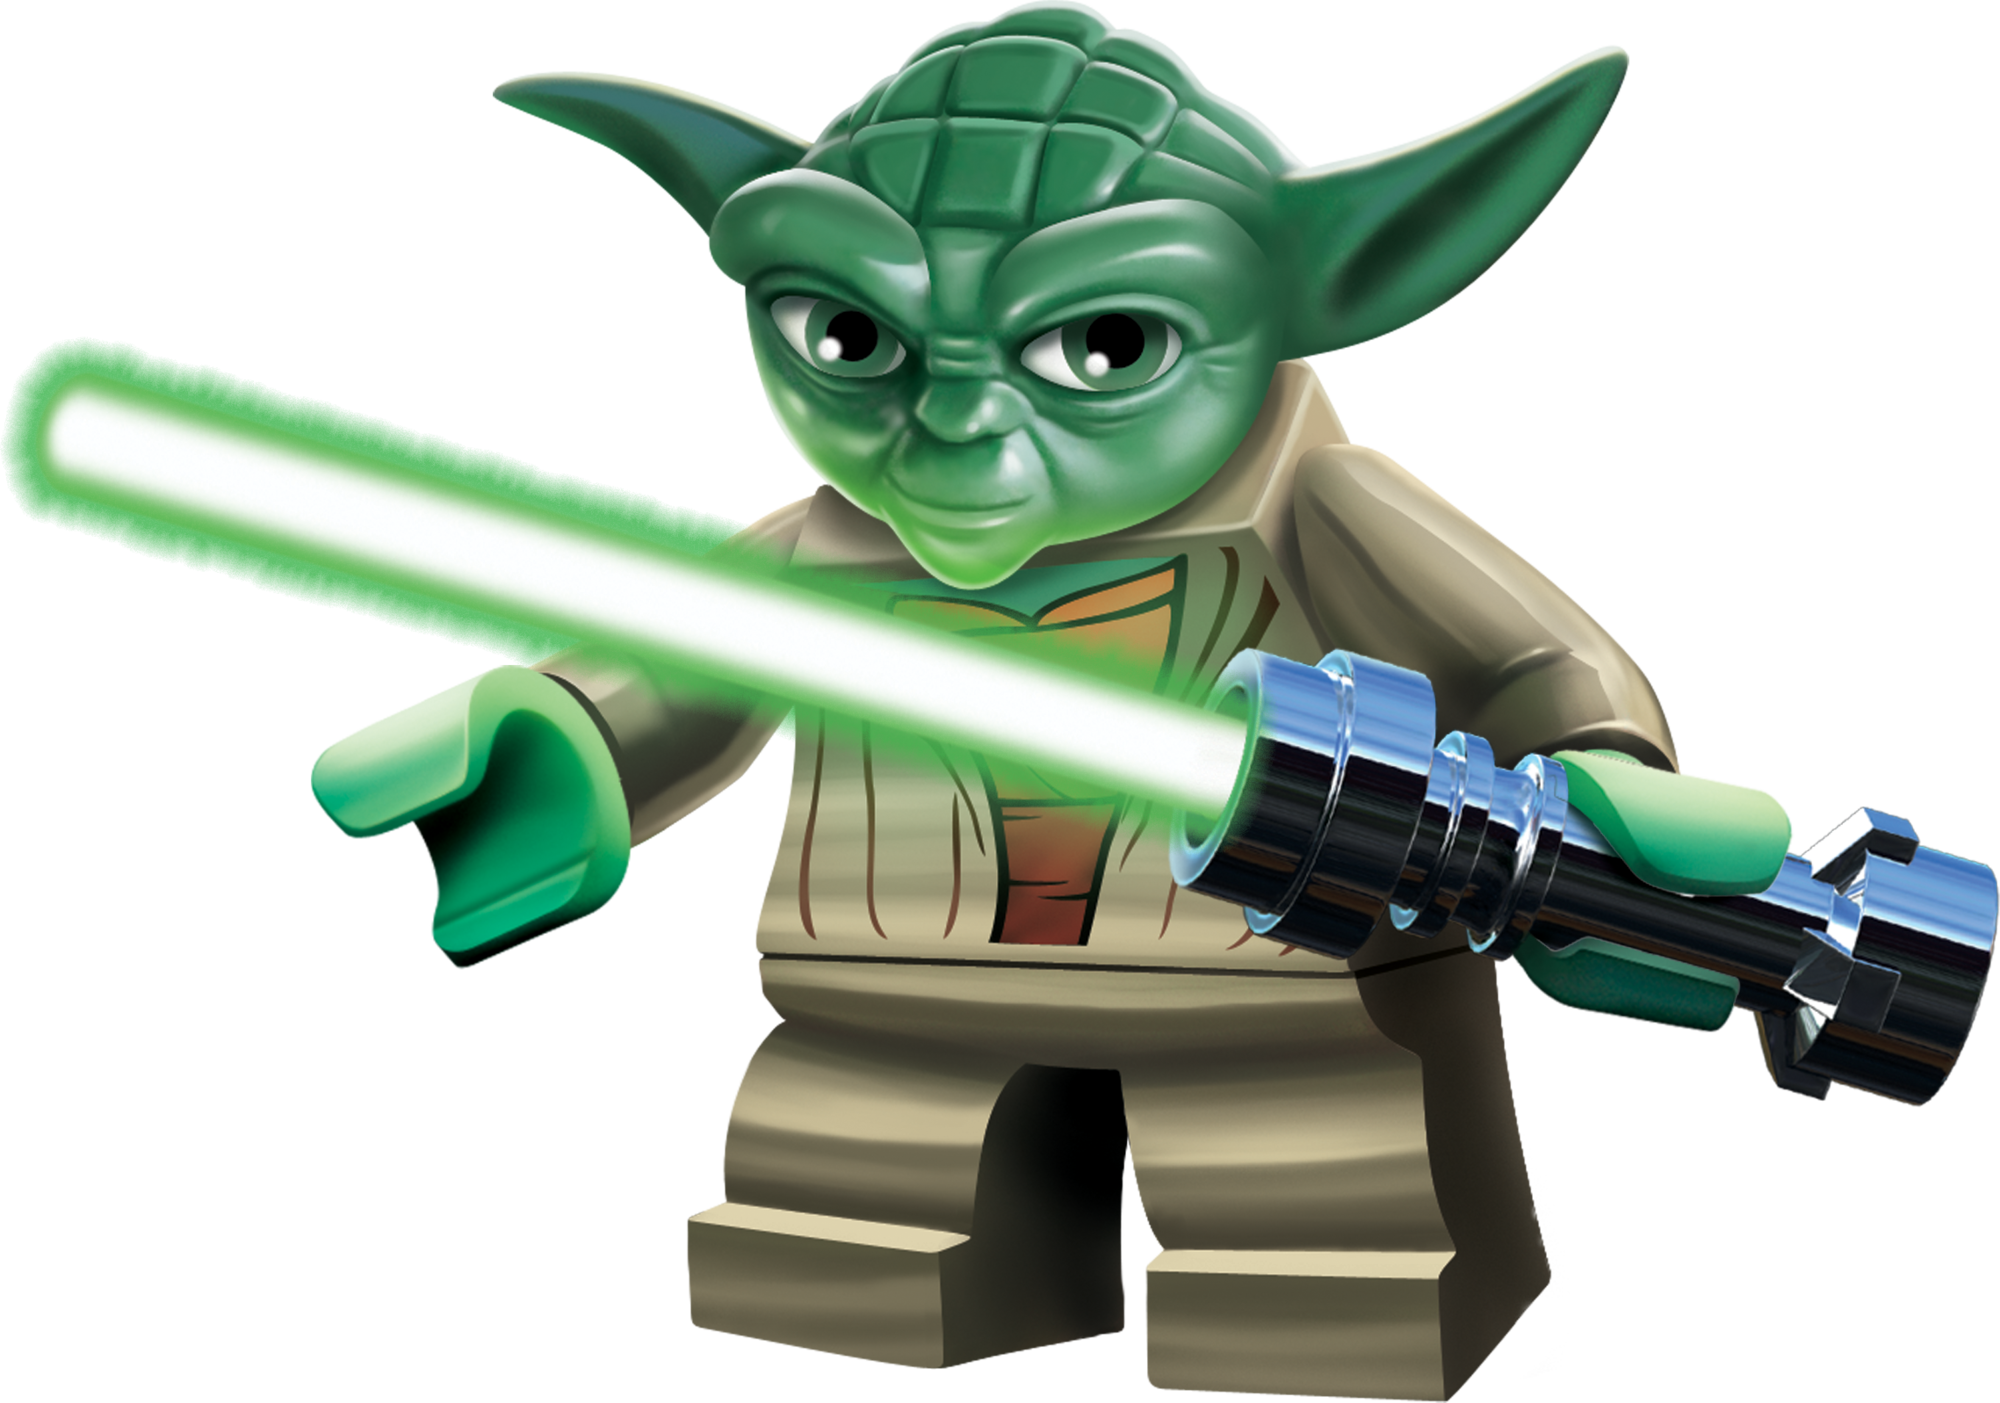 Star Wars Yoda PNG-PlusPNG.com-2000 - Star Wars Yoda PNG